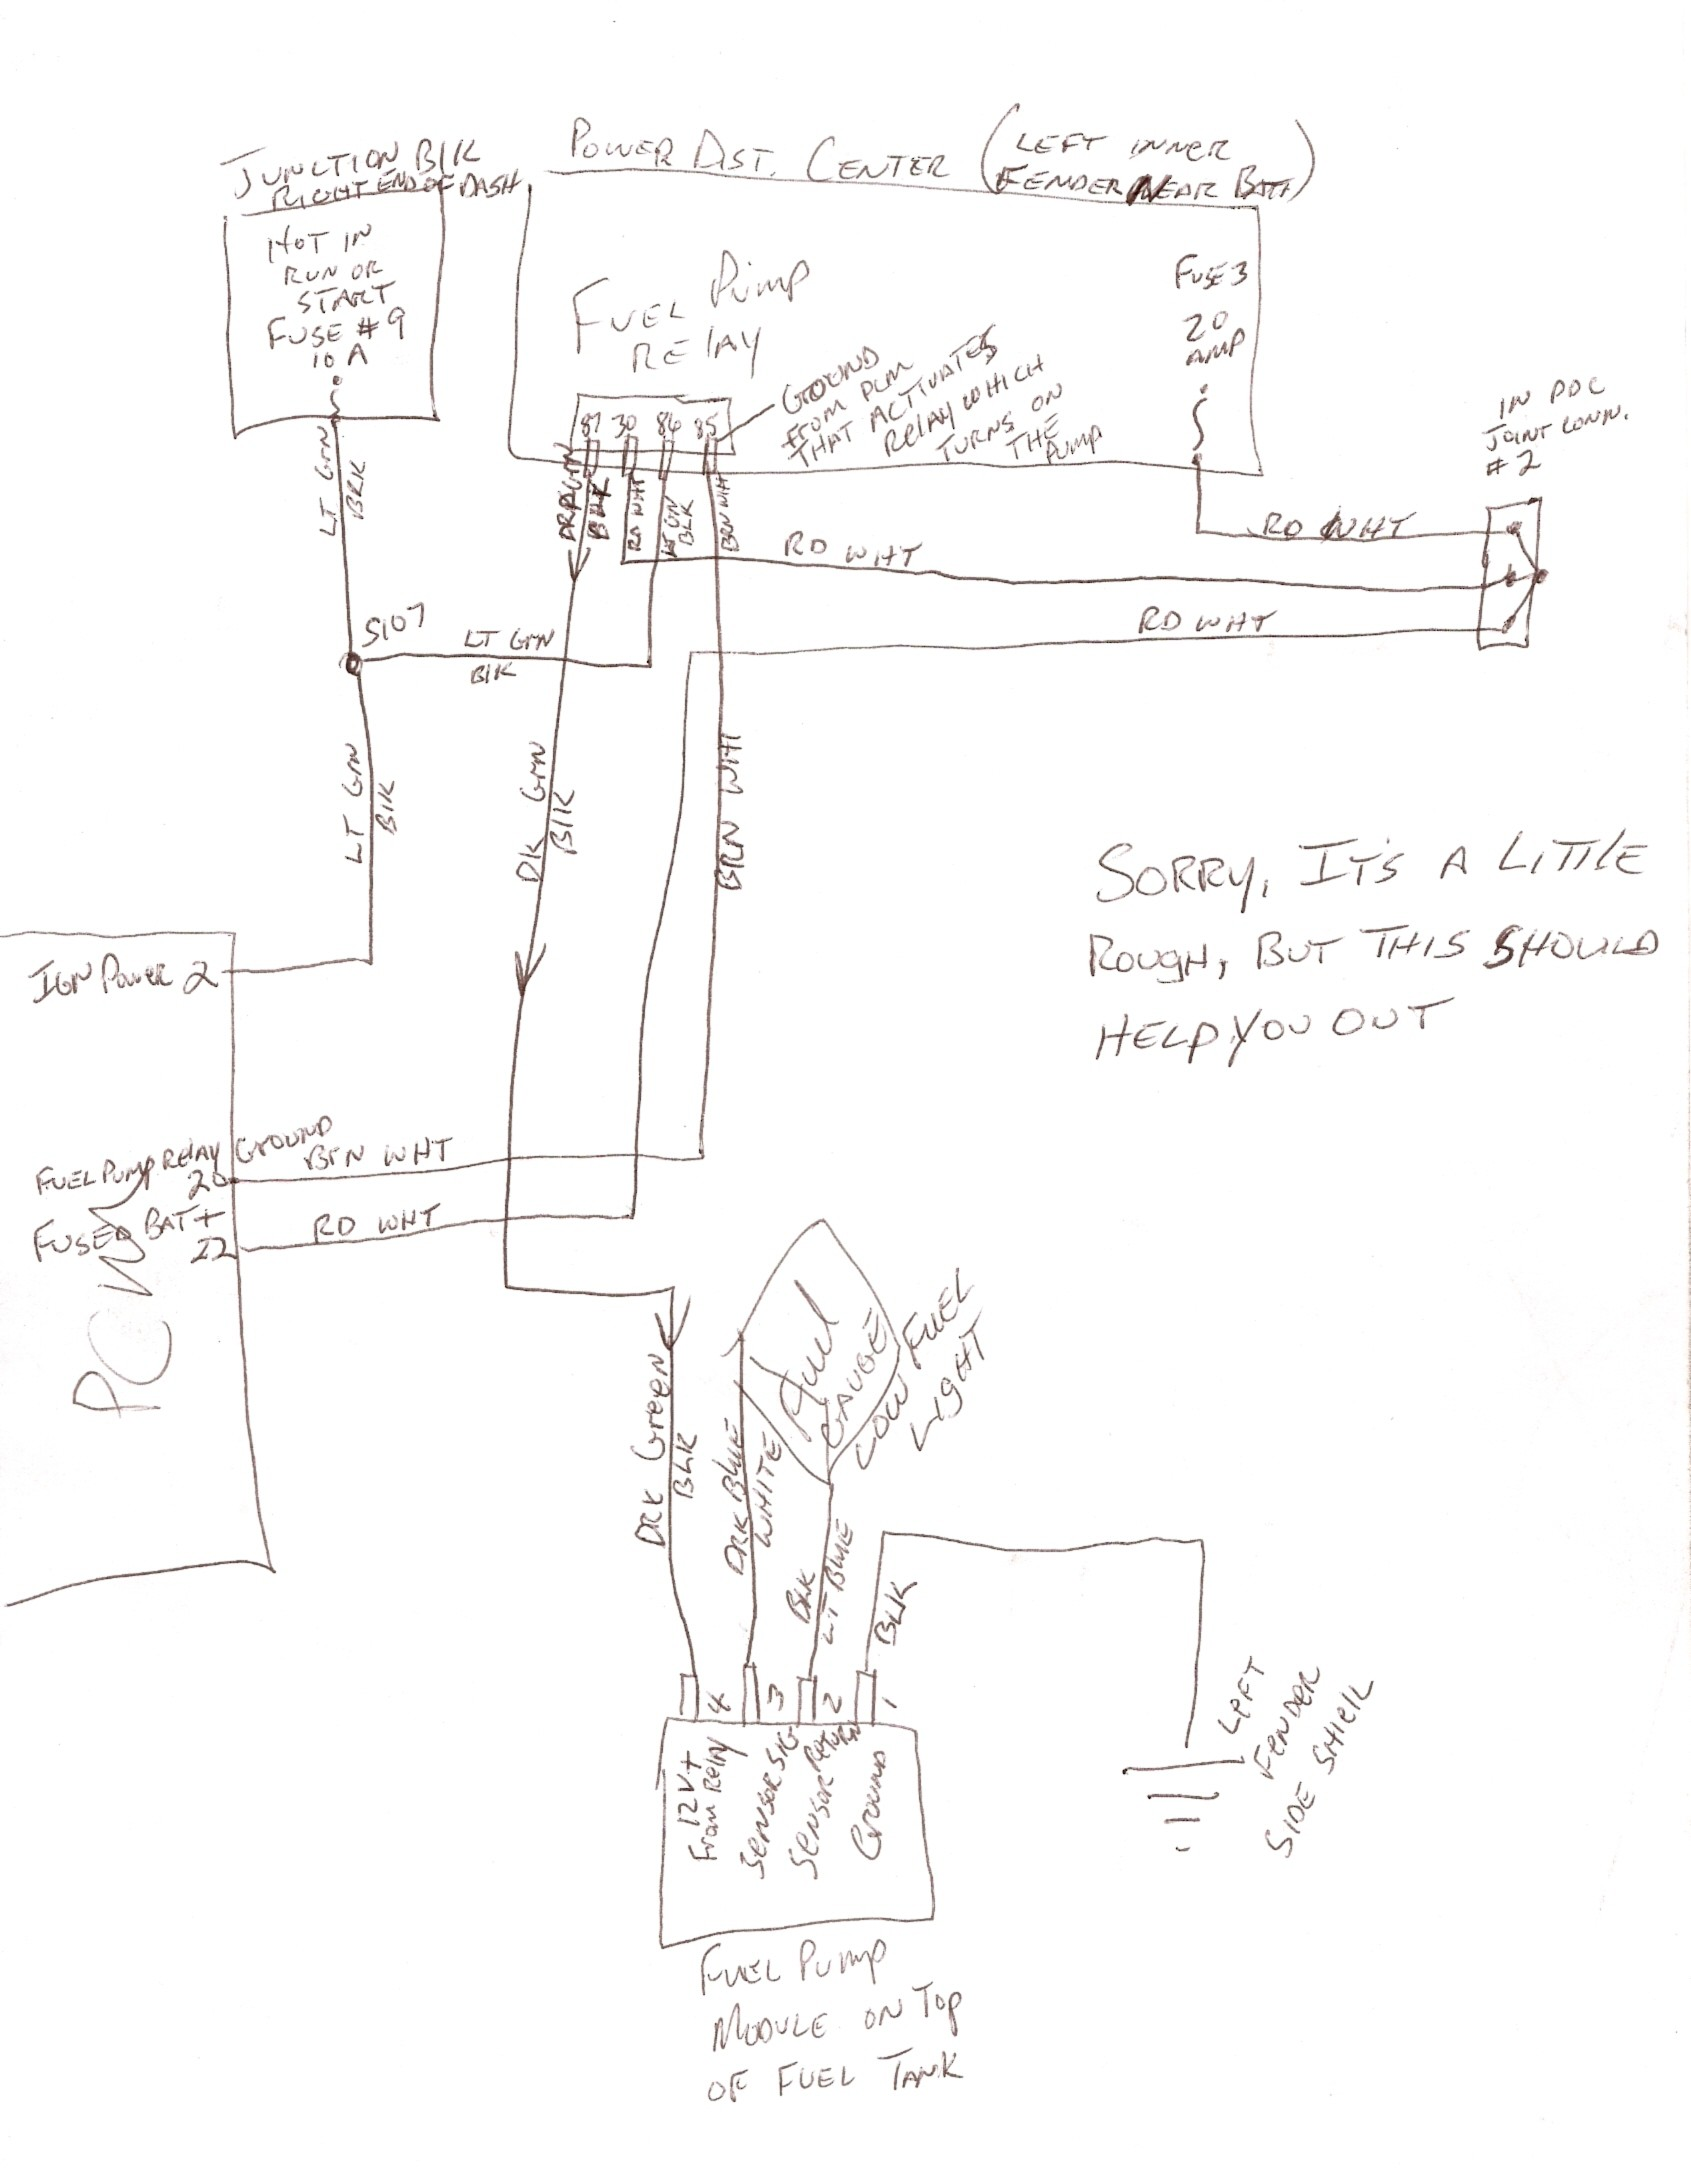 allen bradley reversing motor starter wiring diagram sony cdx sw200 control diagrams impremedia